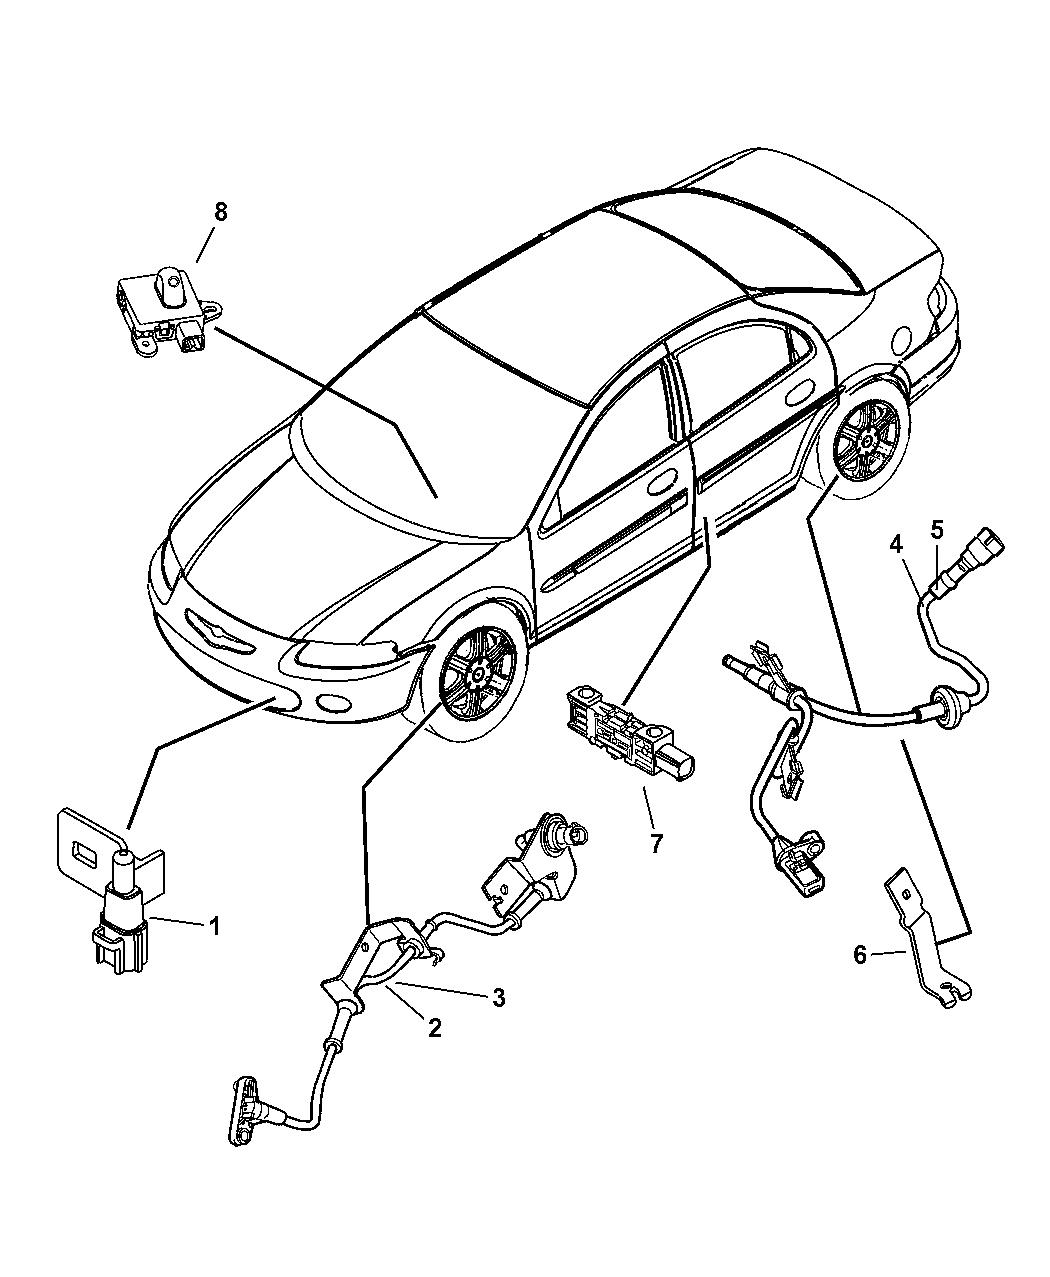 2005 Chrysler Sebring Sedan & Convertible Sensors